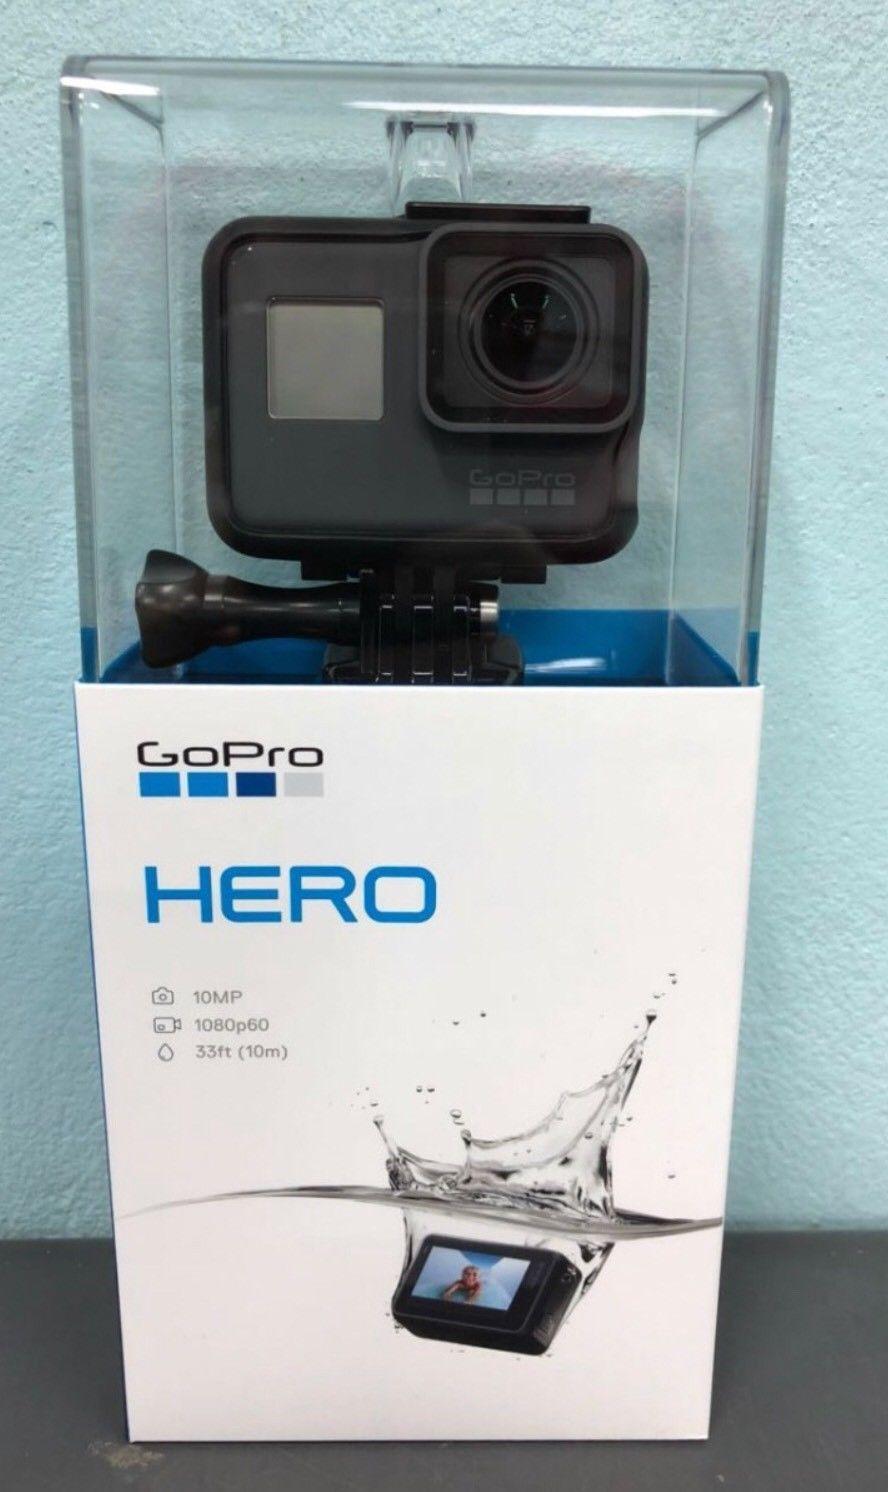 GoPro Hero 18 1080P 60 HD Digicam 10MP CHDHB-501-RW